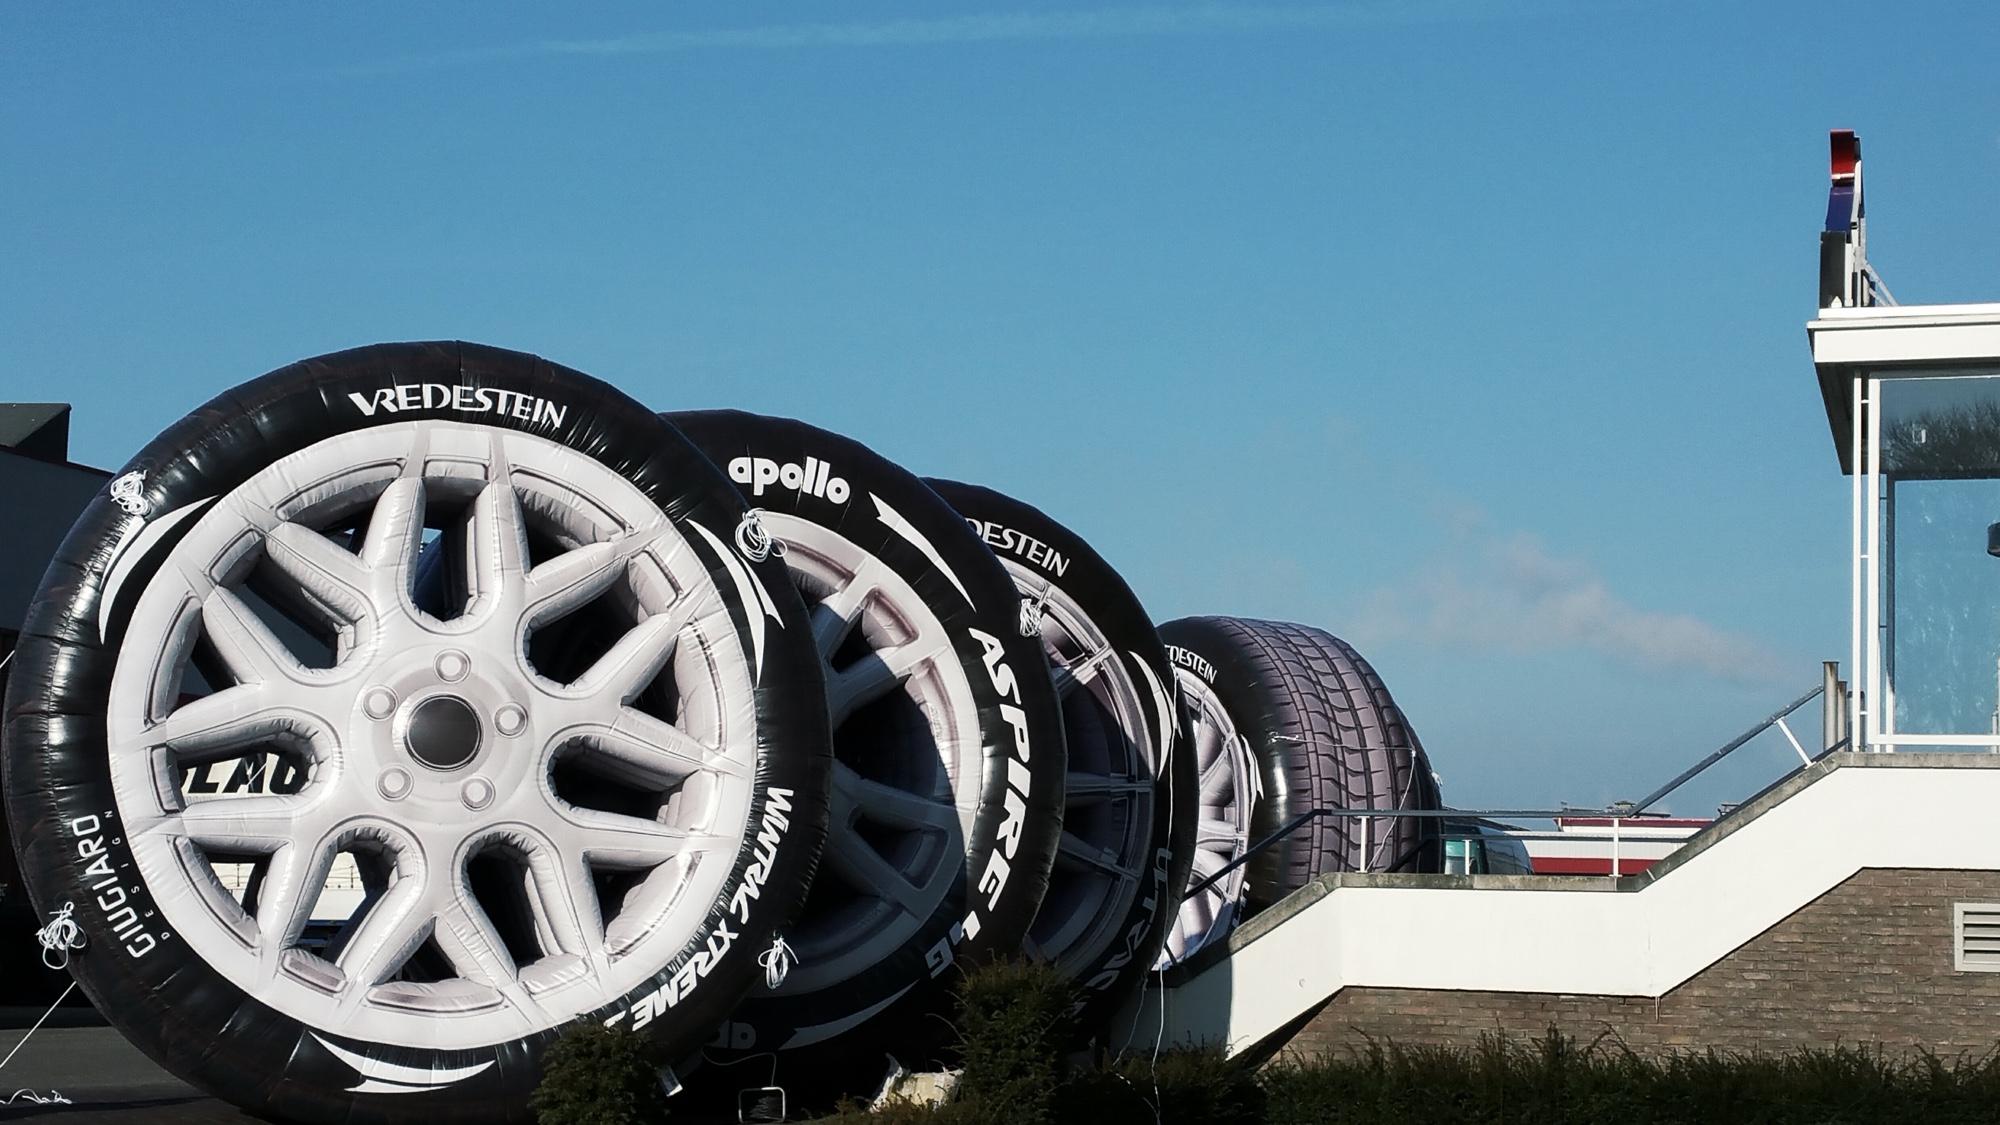 Opblaasbare autobanden reuze grote blowups product replicas - apollo-vredestein - Publi air